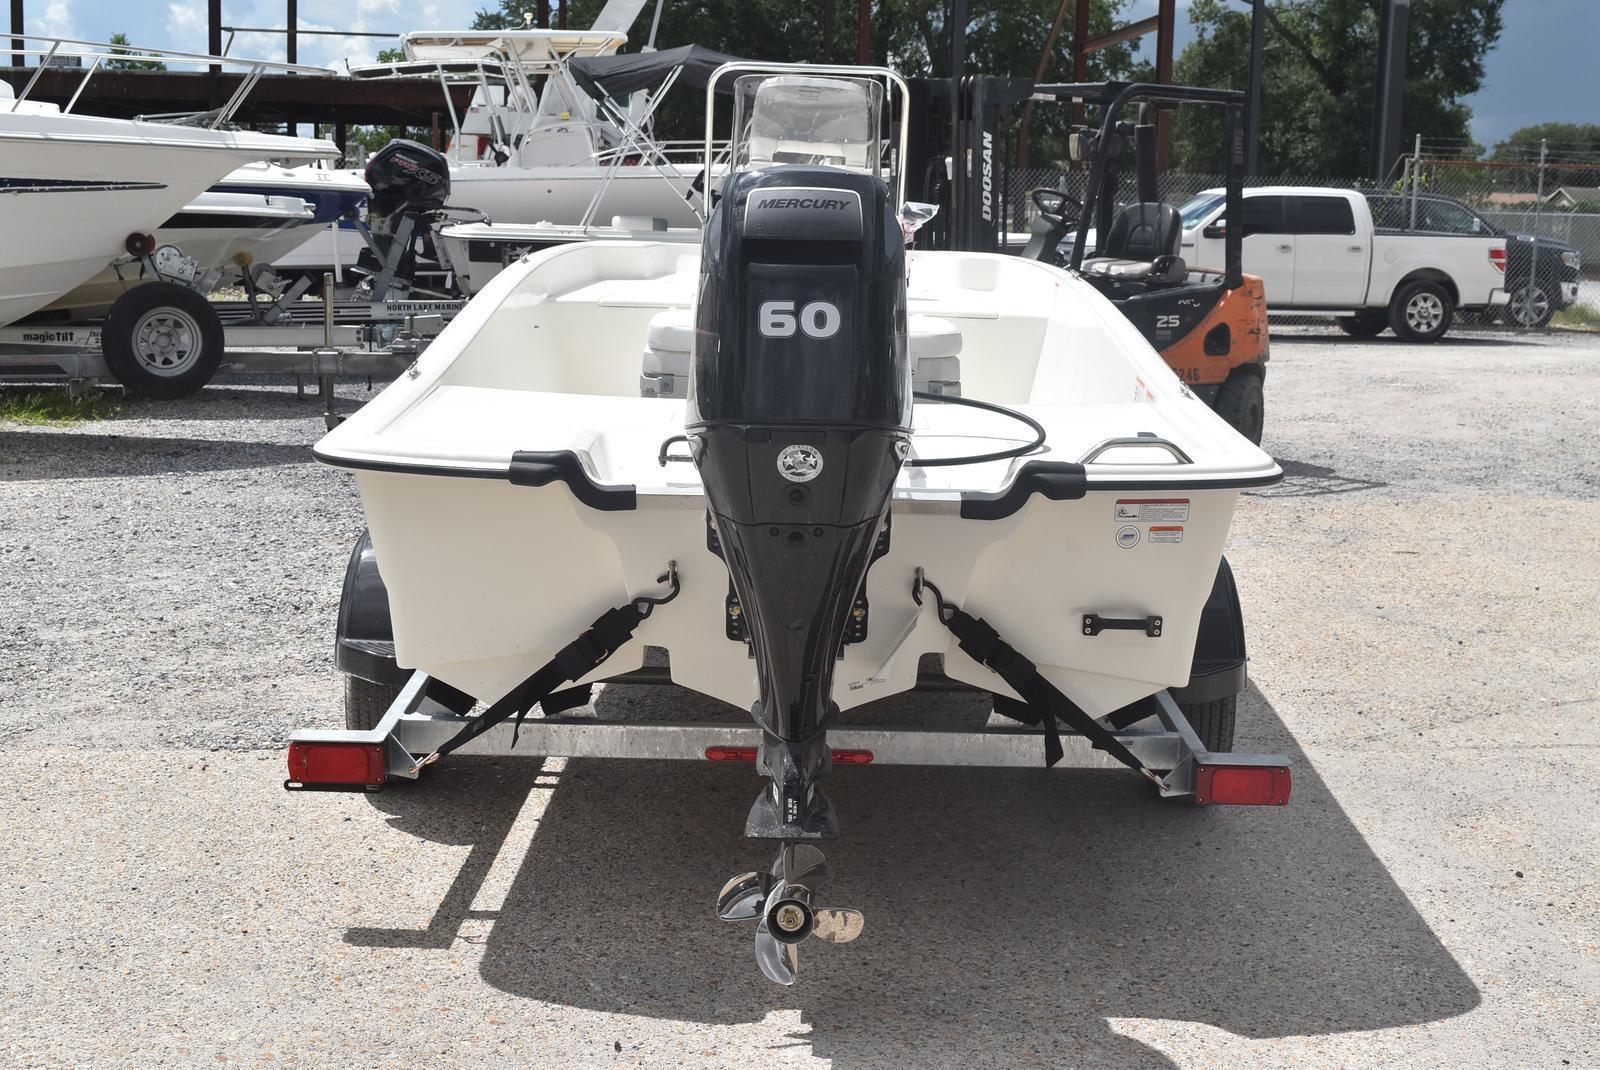 2020 Mako boat for sale, model of the boat is Pro Skiff 17, 75 ELPT & Image # 8 of 9